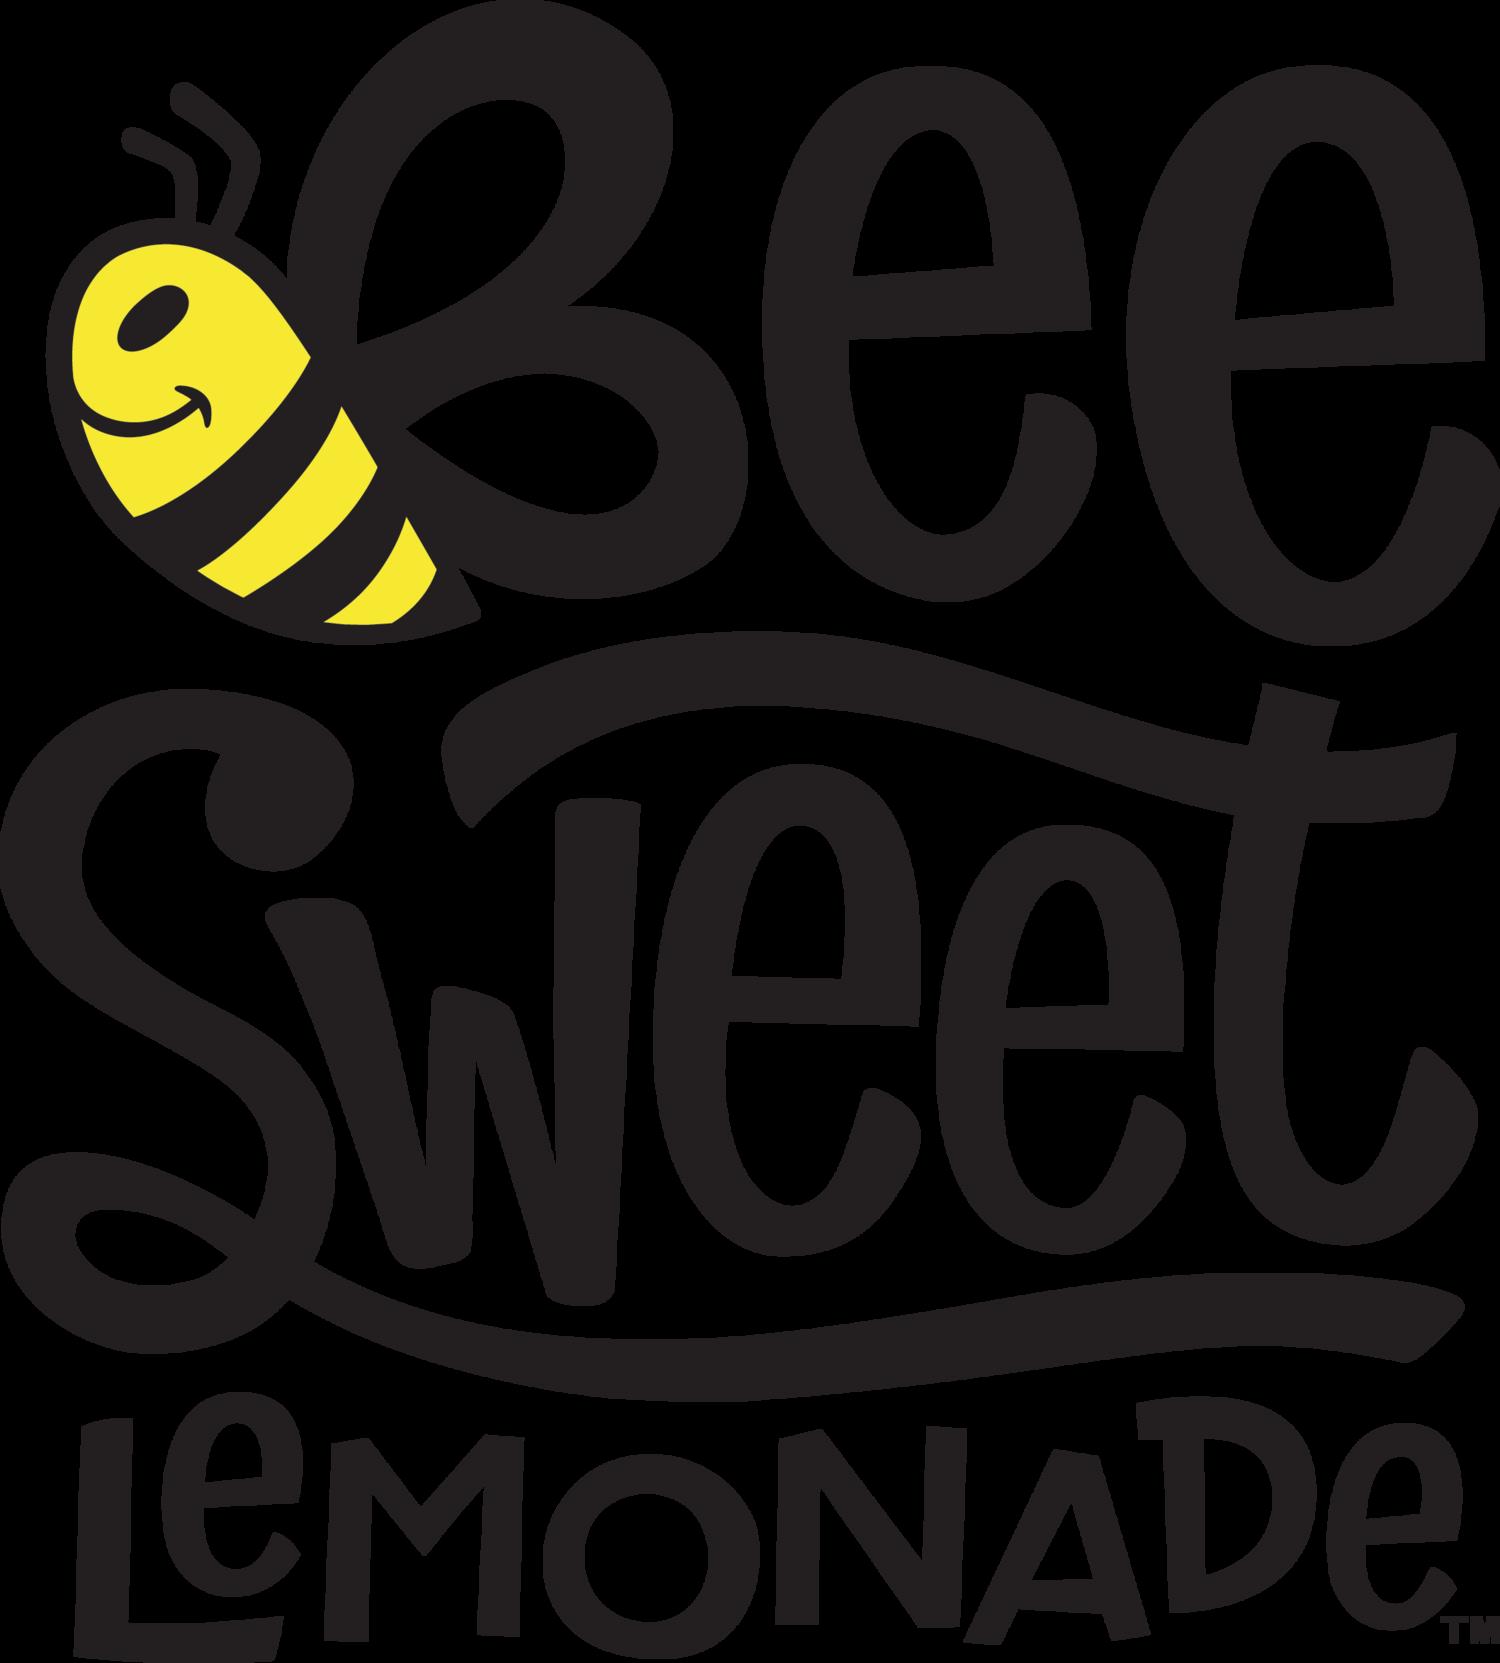 BeeSweet Lemonade